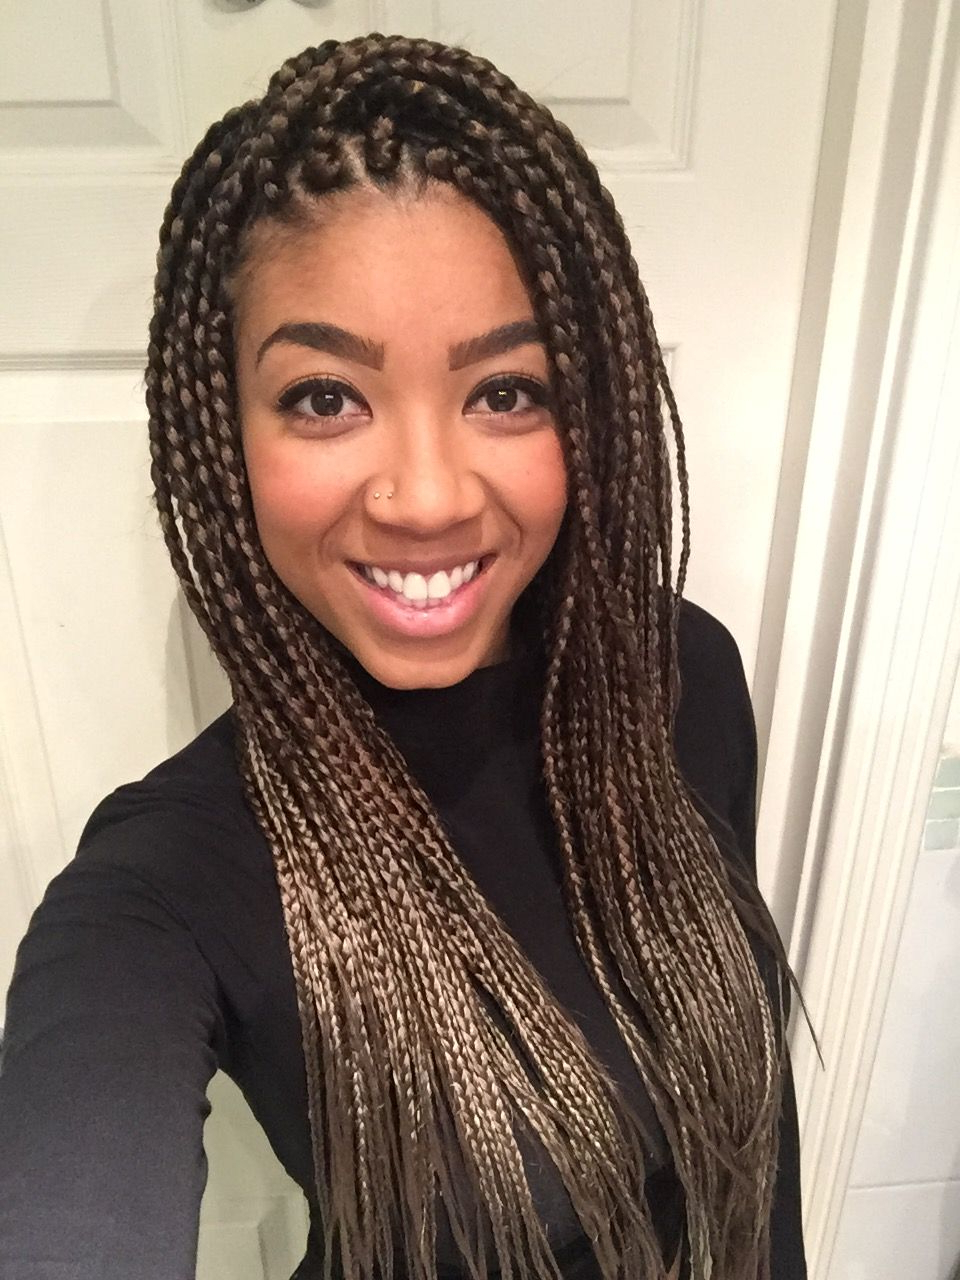 Most Current Light Brown Braid Hairstyles Regarding Box Braids! Medium Long, Two Tone Light Brown/golden (View 2 of 20)